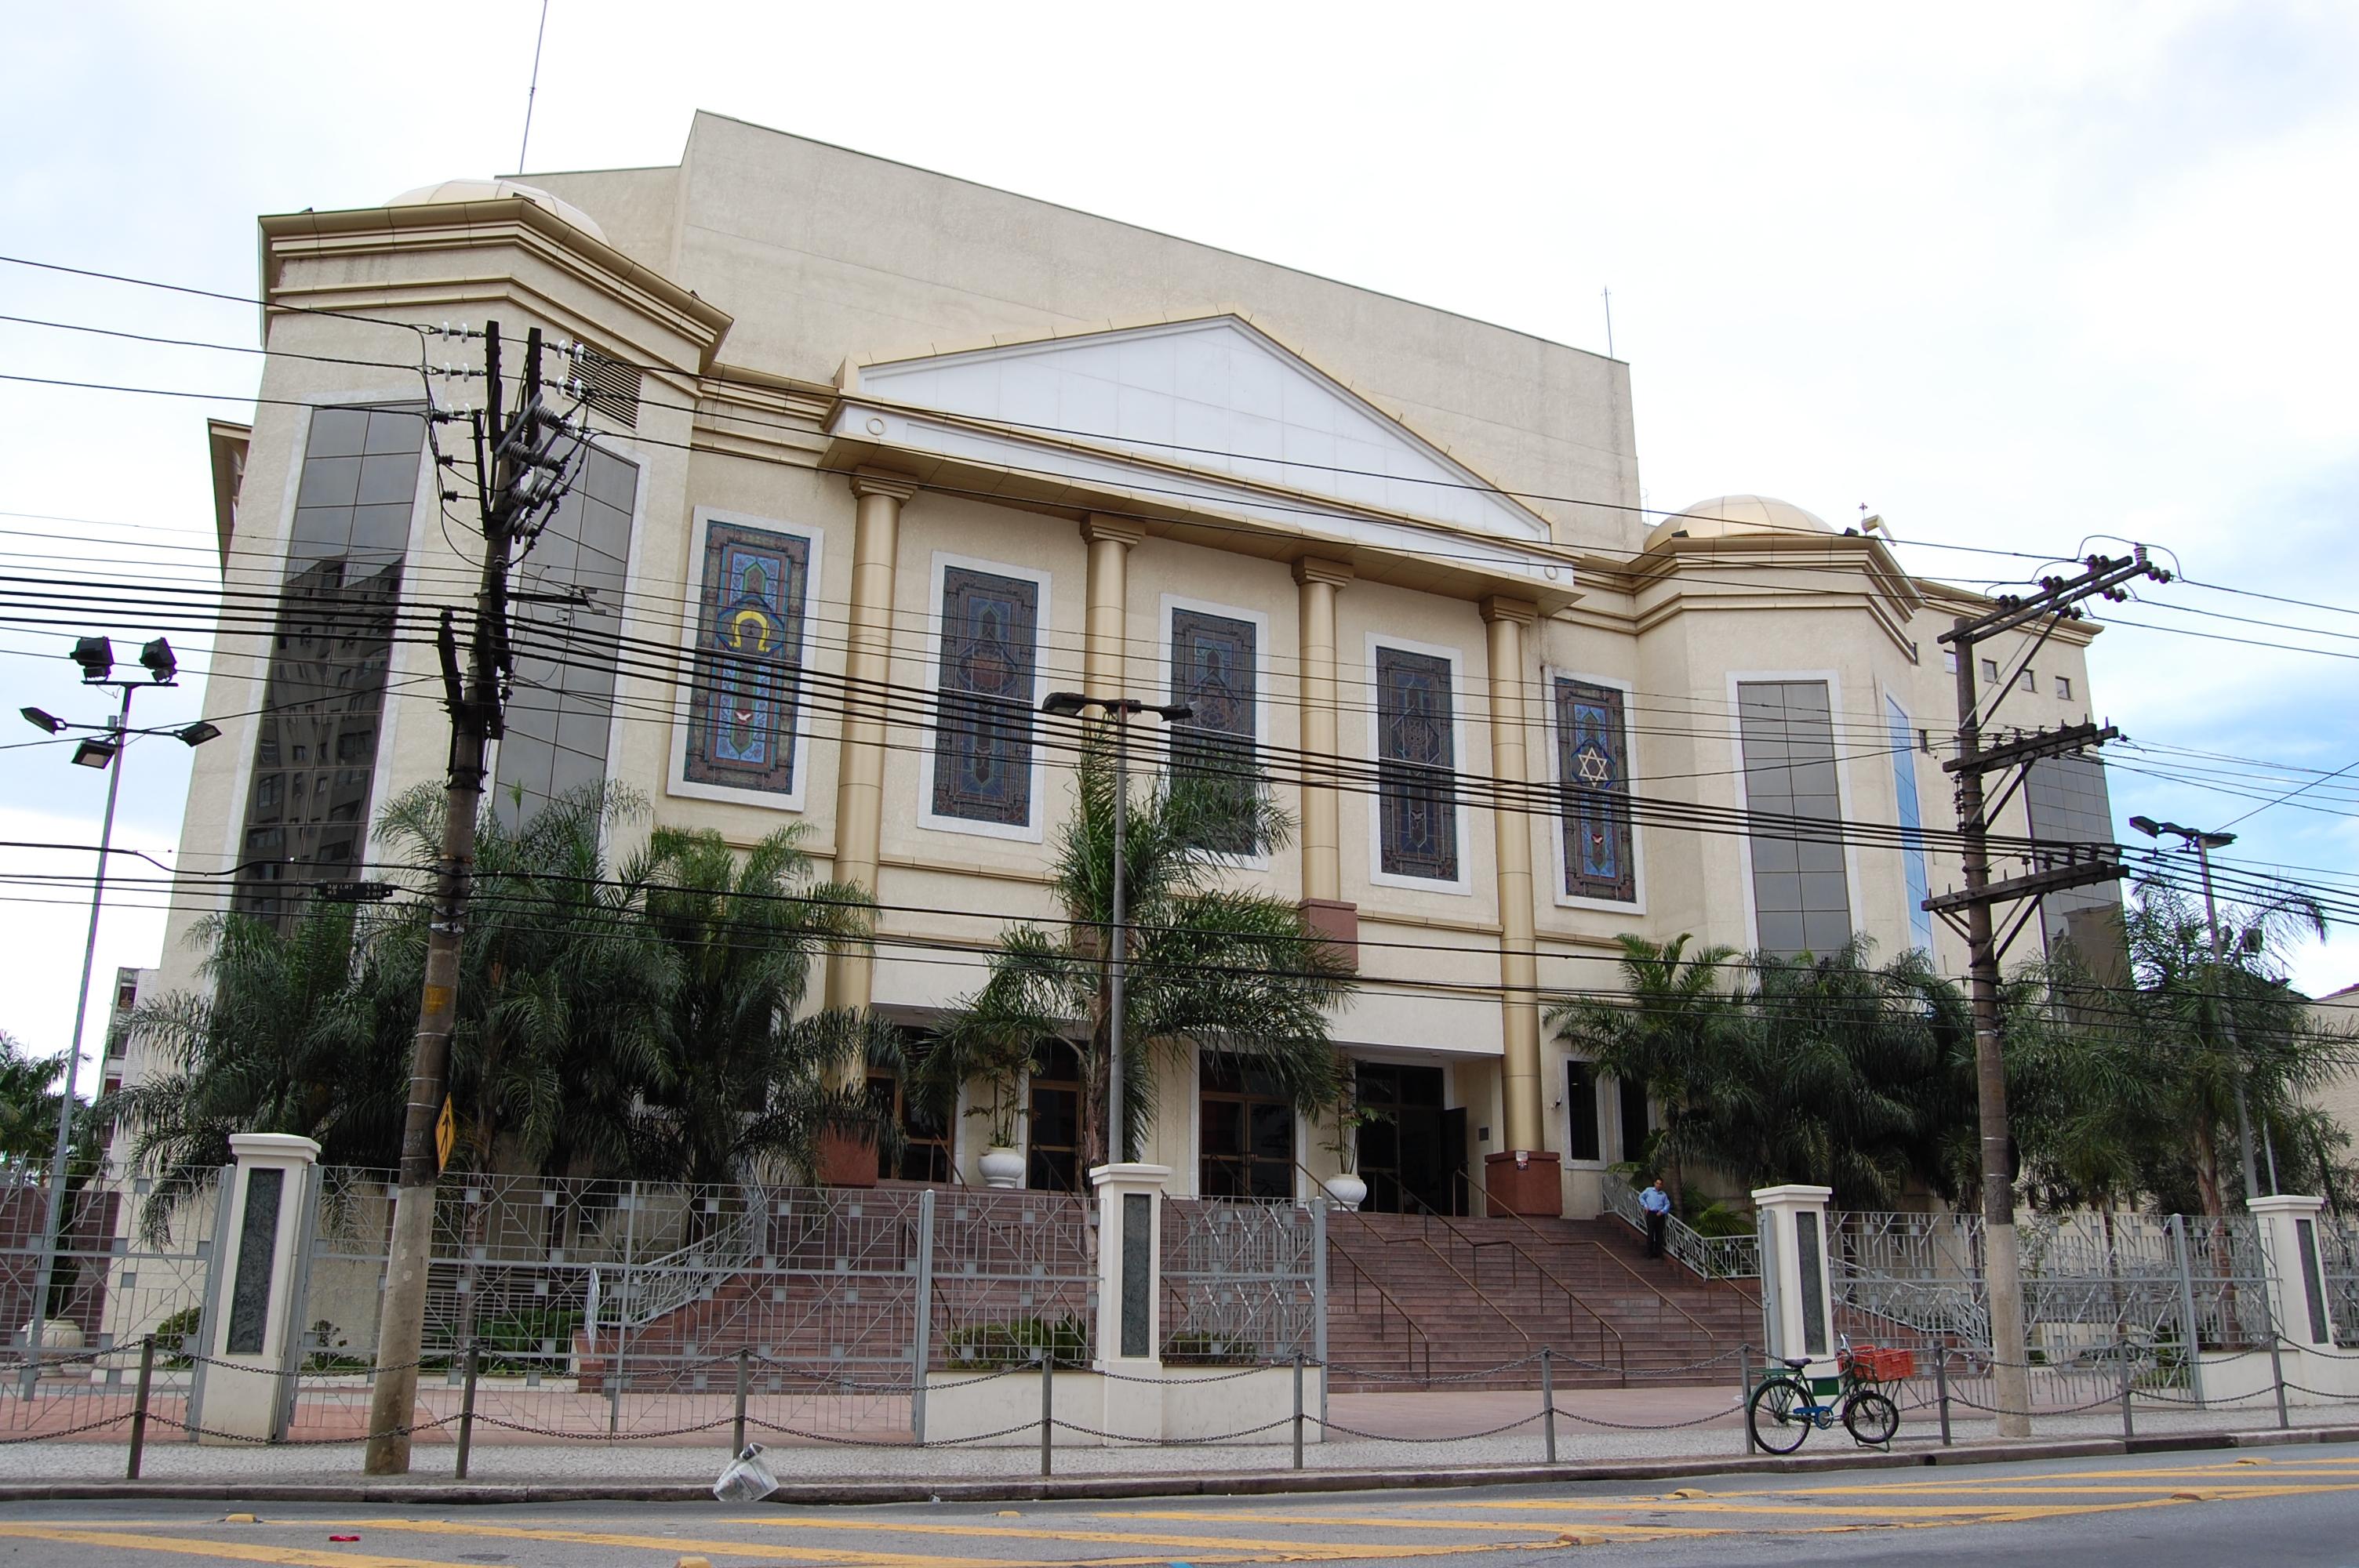 http://upload.wikimedia.org/wikipedia/commons/f/ff/Catedral_da_Igreja_Universal_do_Reino_de_Deus.jpg